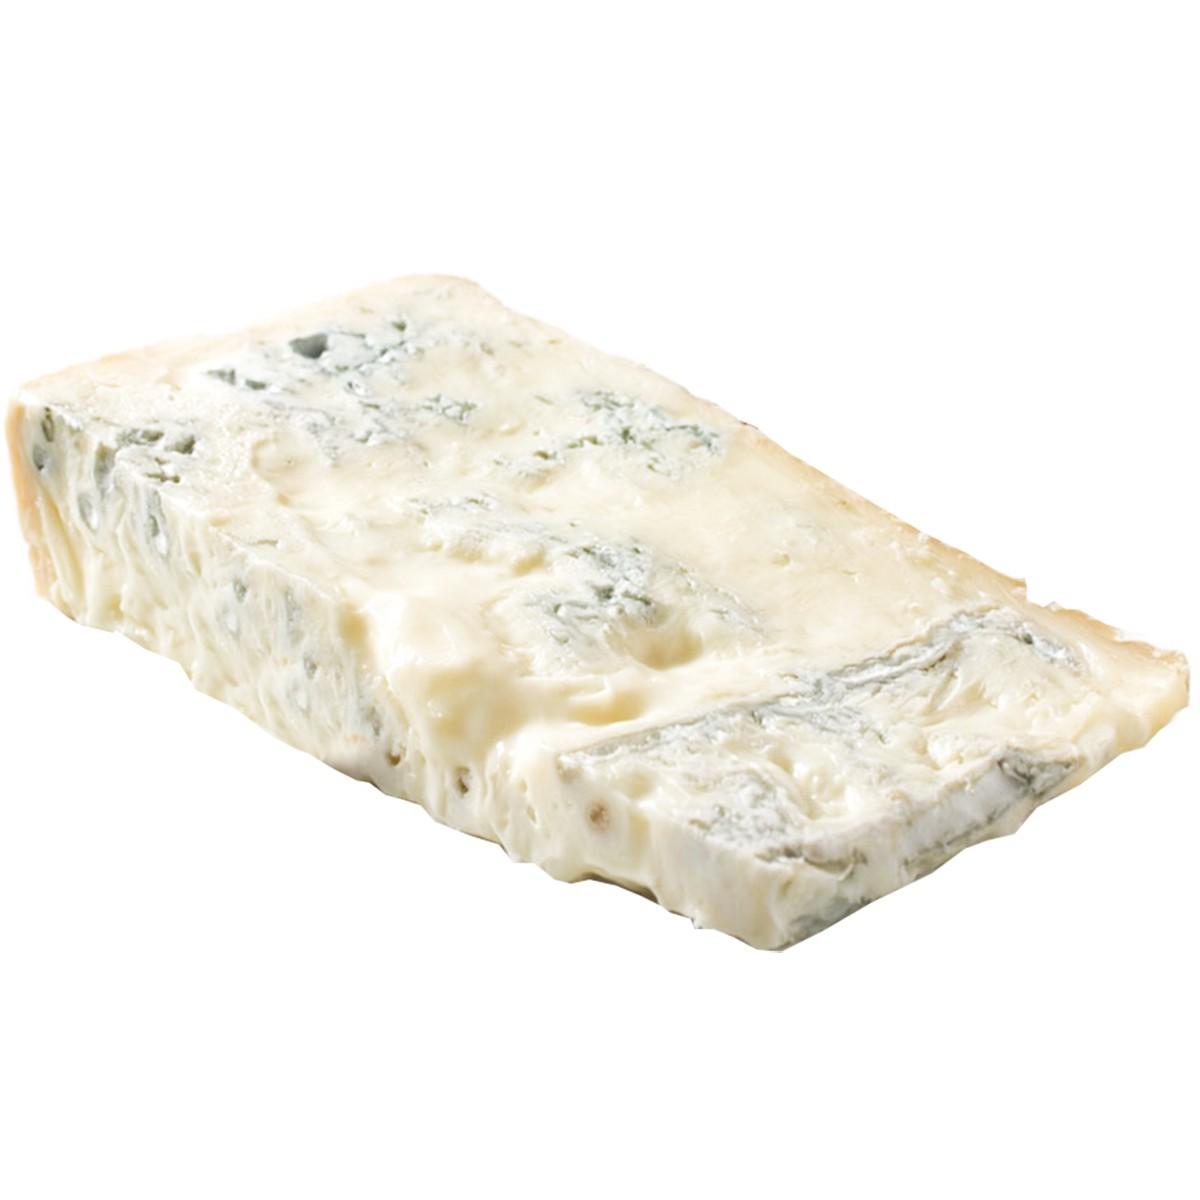 Сыр с плесенью Gorgonzola Perla фото